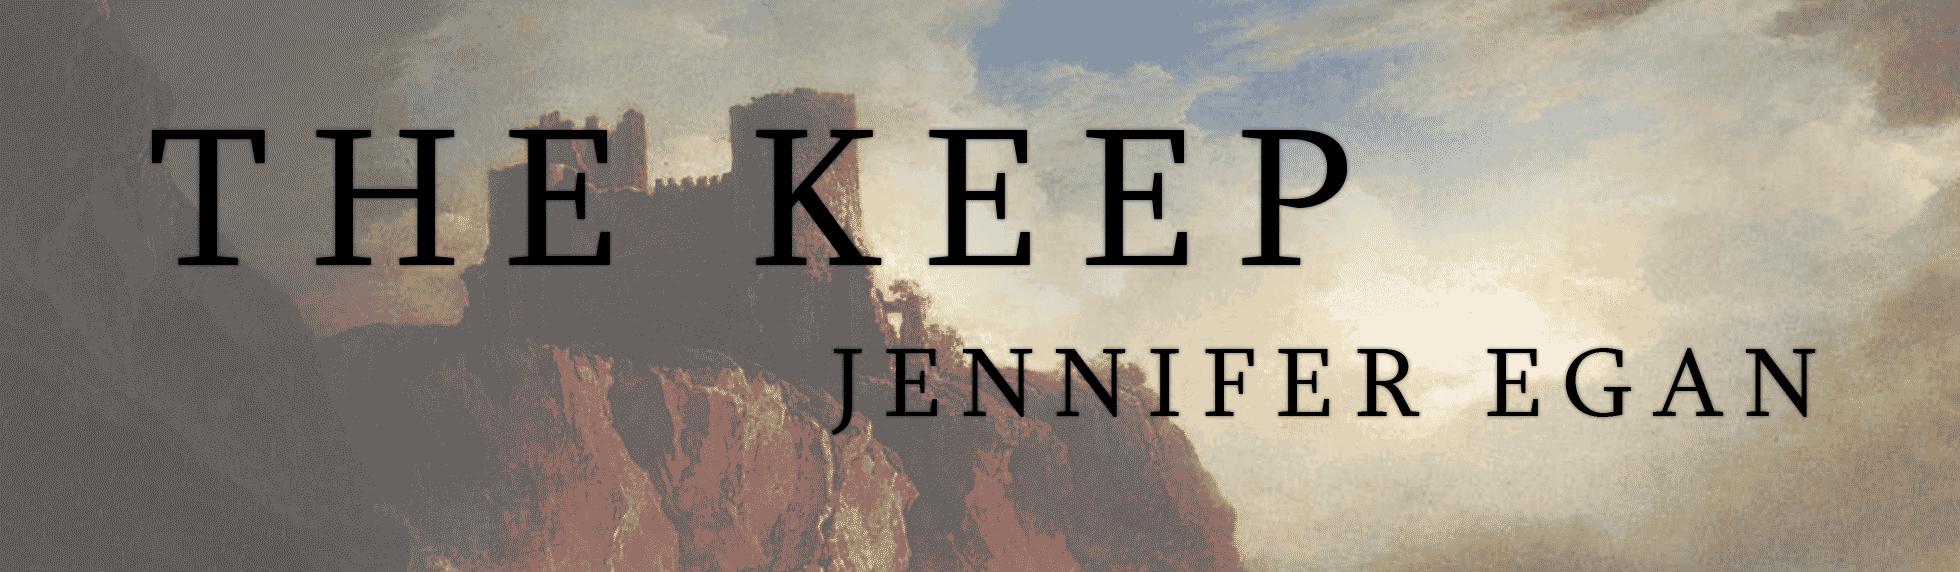 the keep jennifer egan